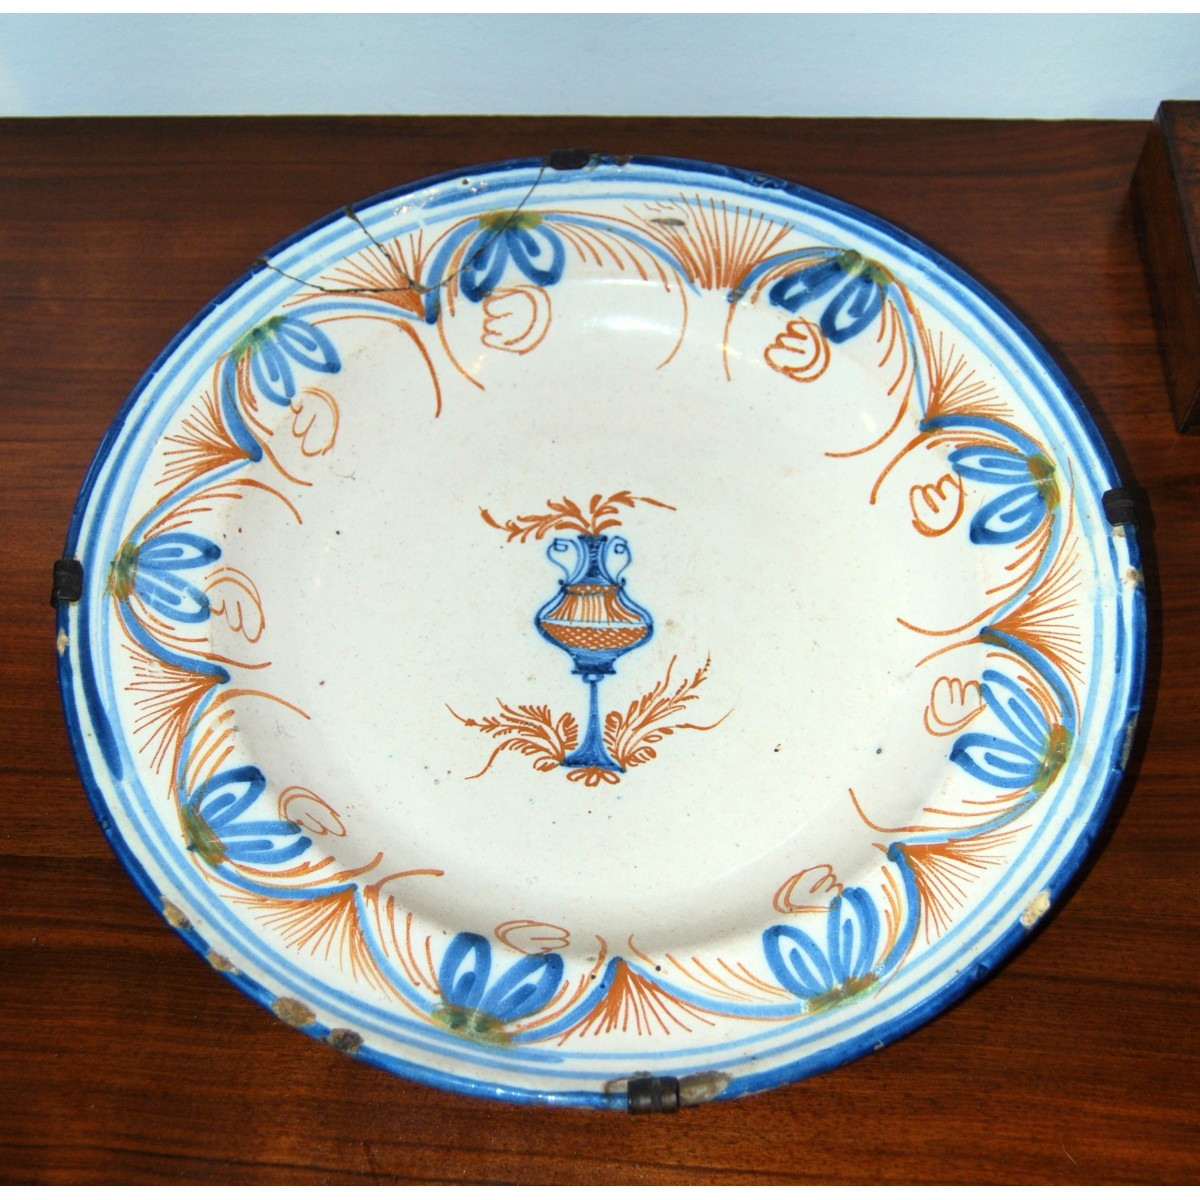 PLato de cerámica de Ribesalbes, Castellón.